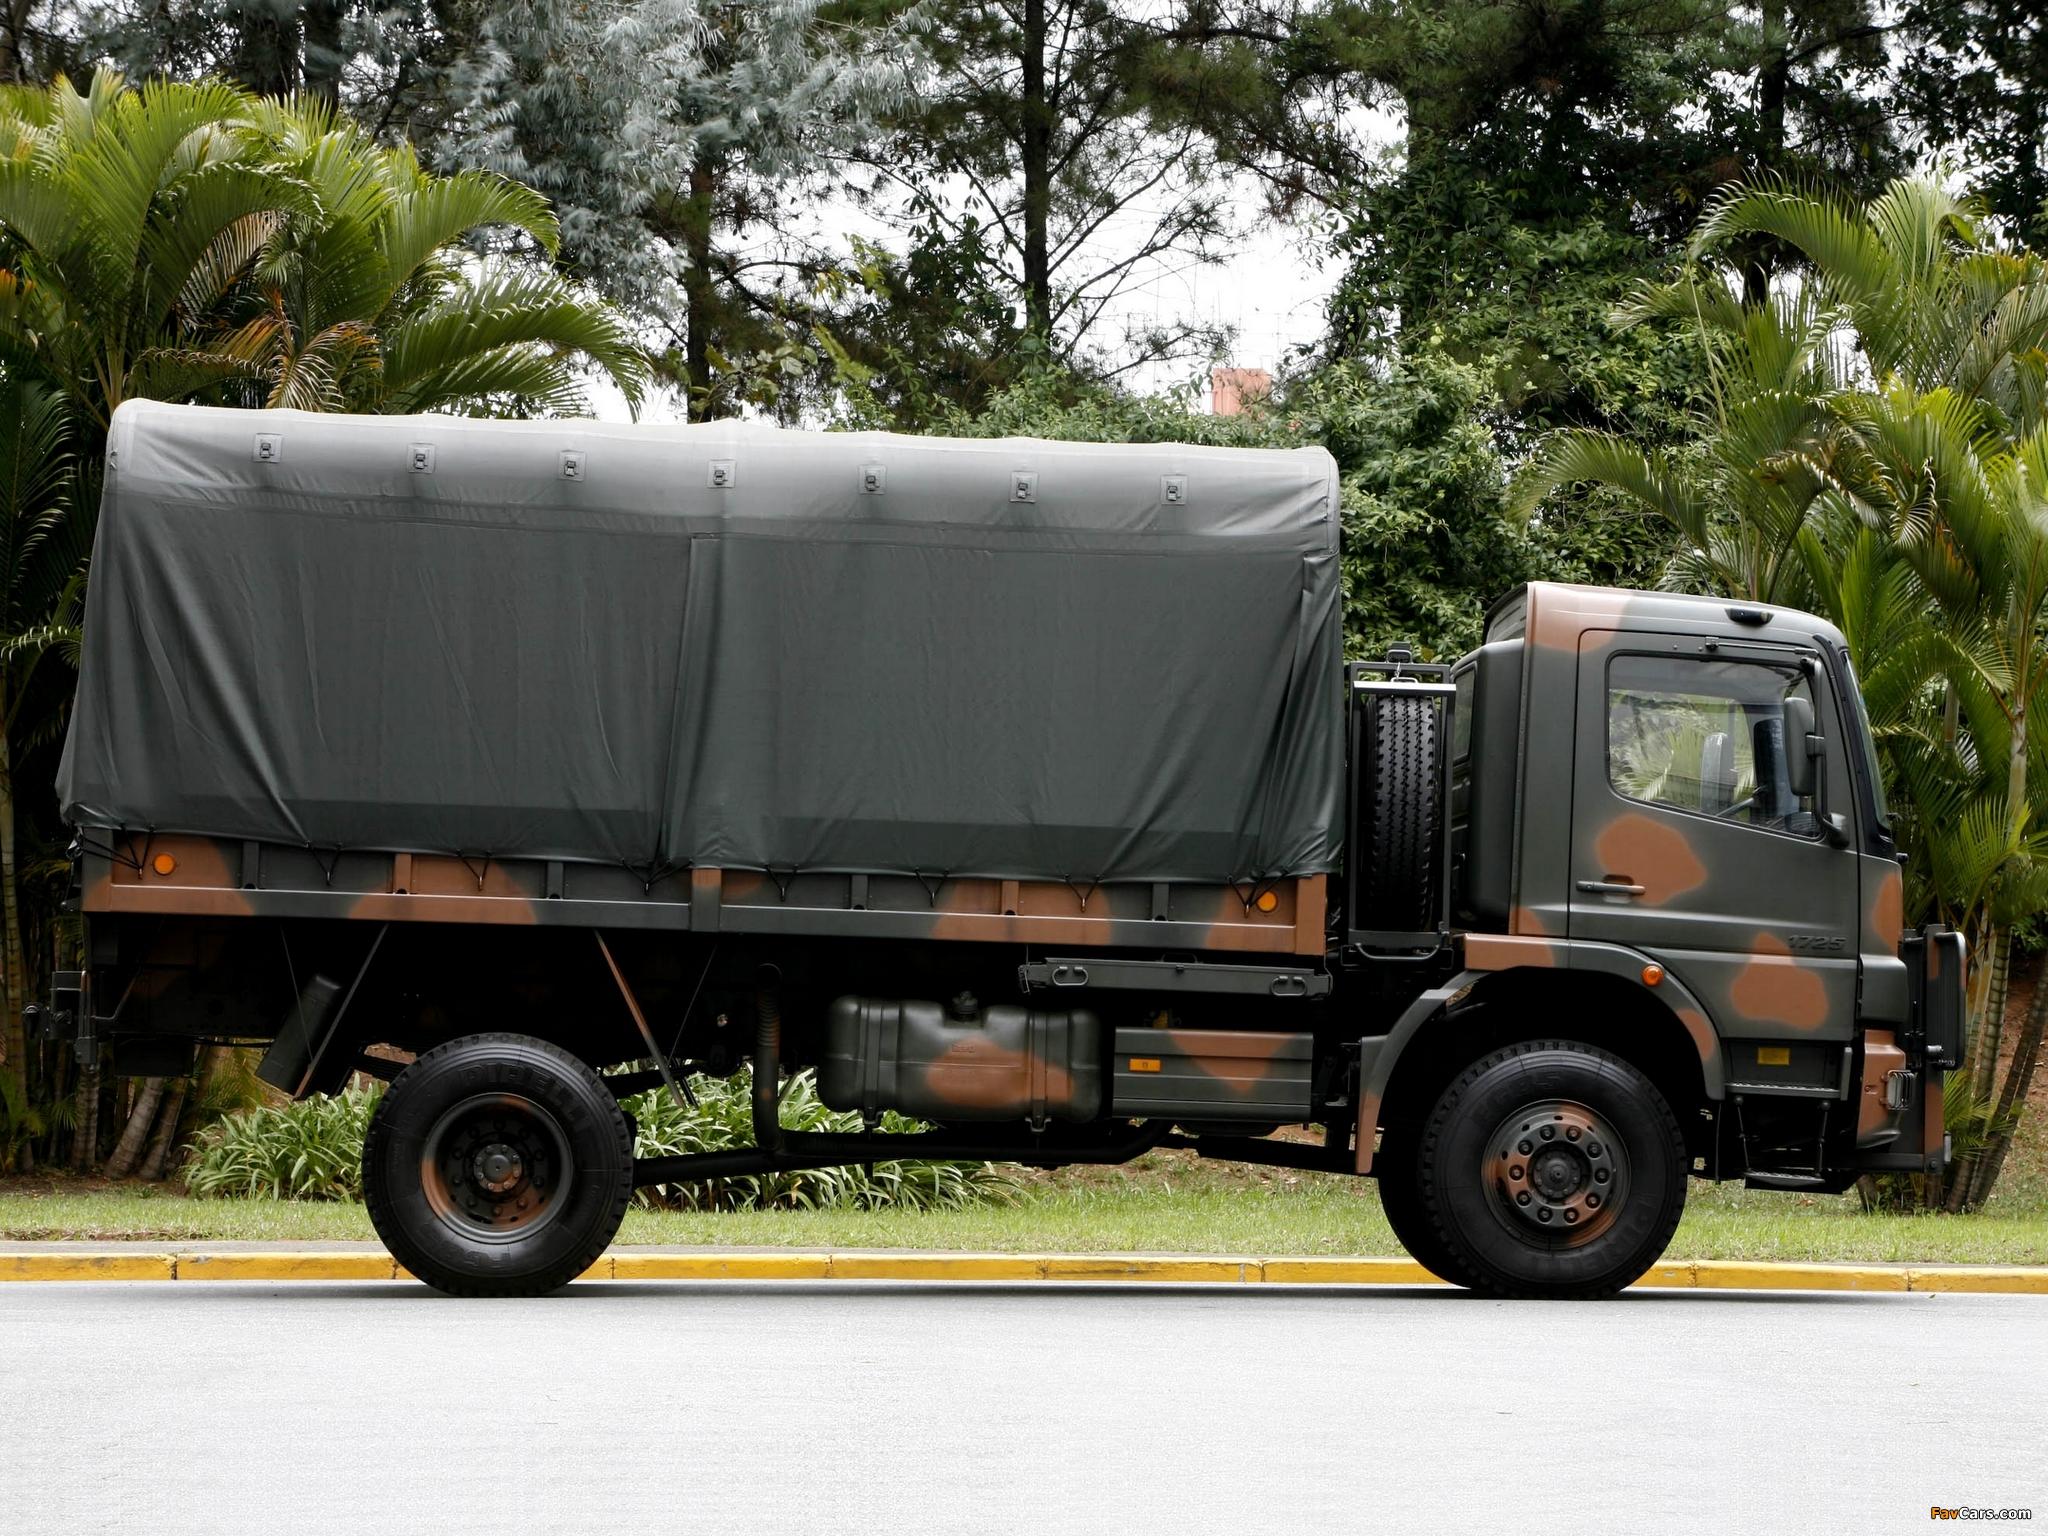 Mercedes Benz Atego 1725 4x4 Military Truck 2005 11